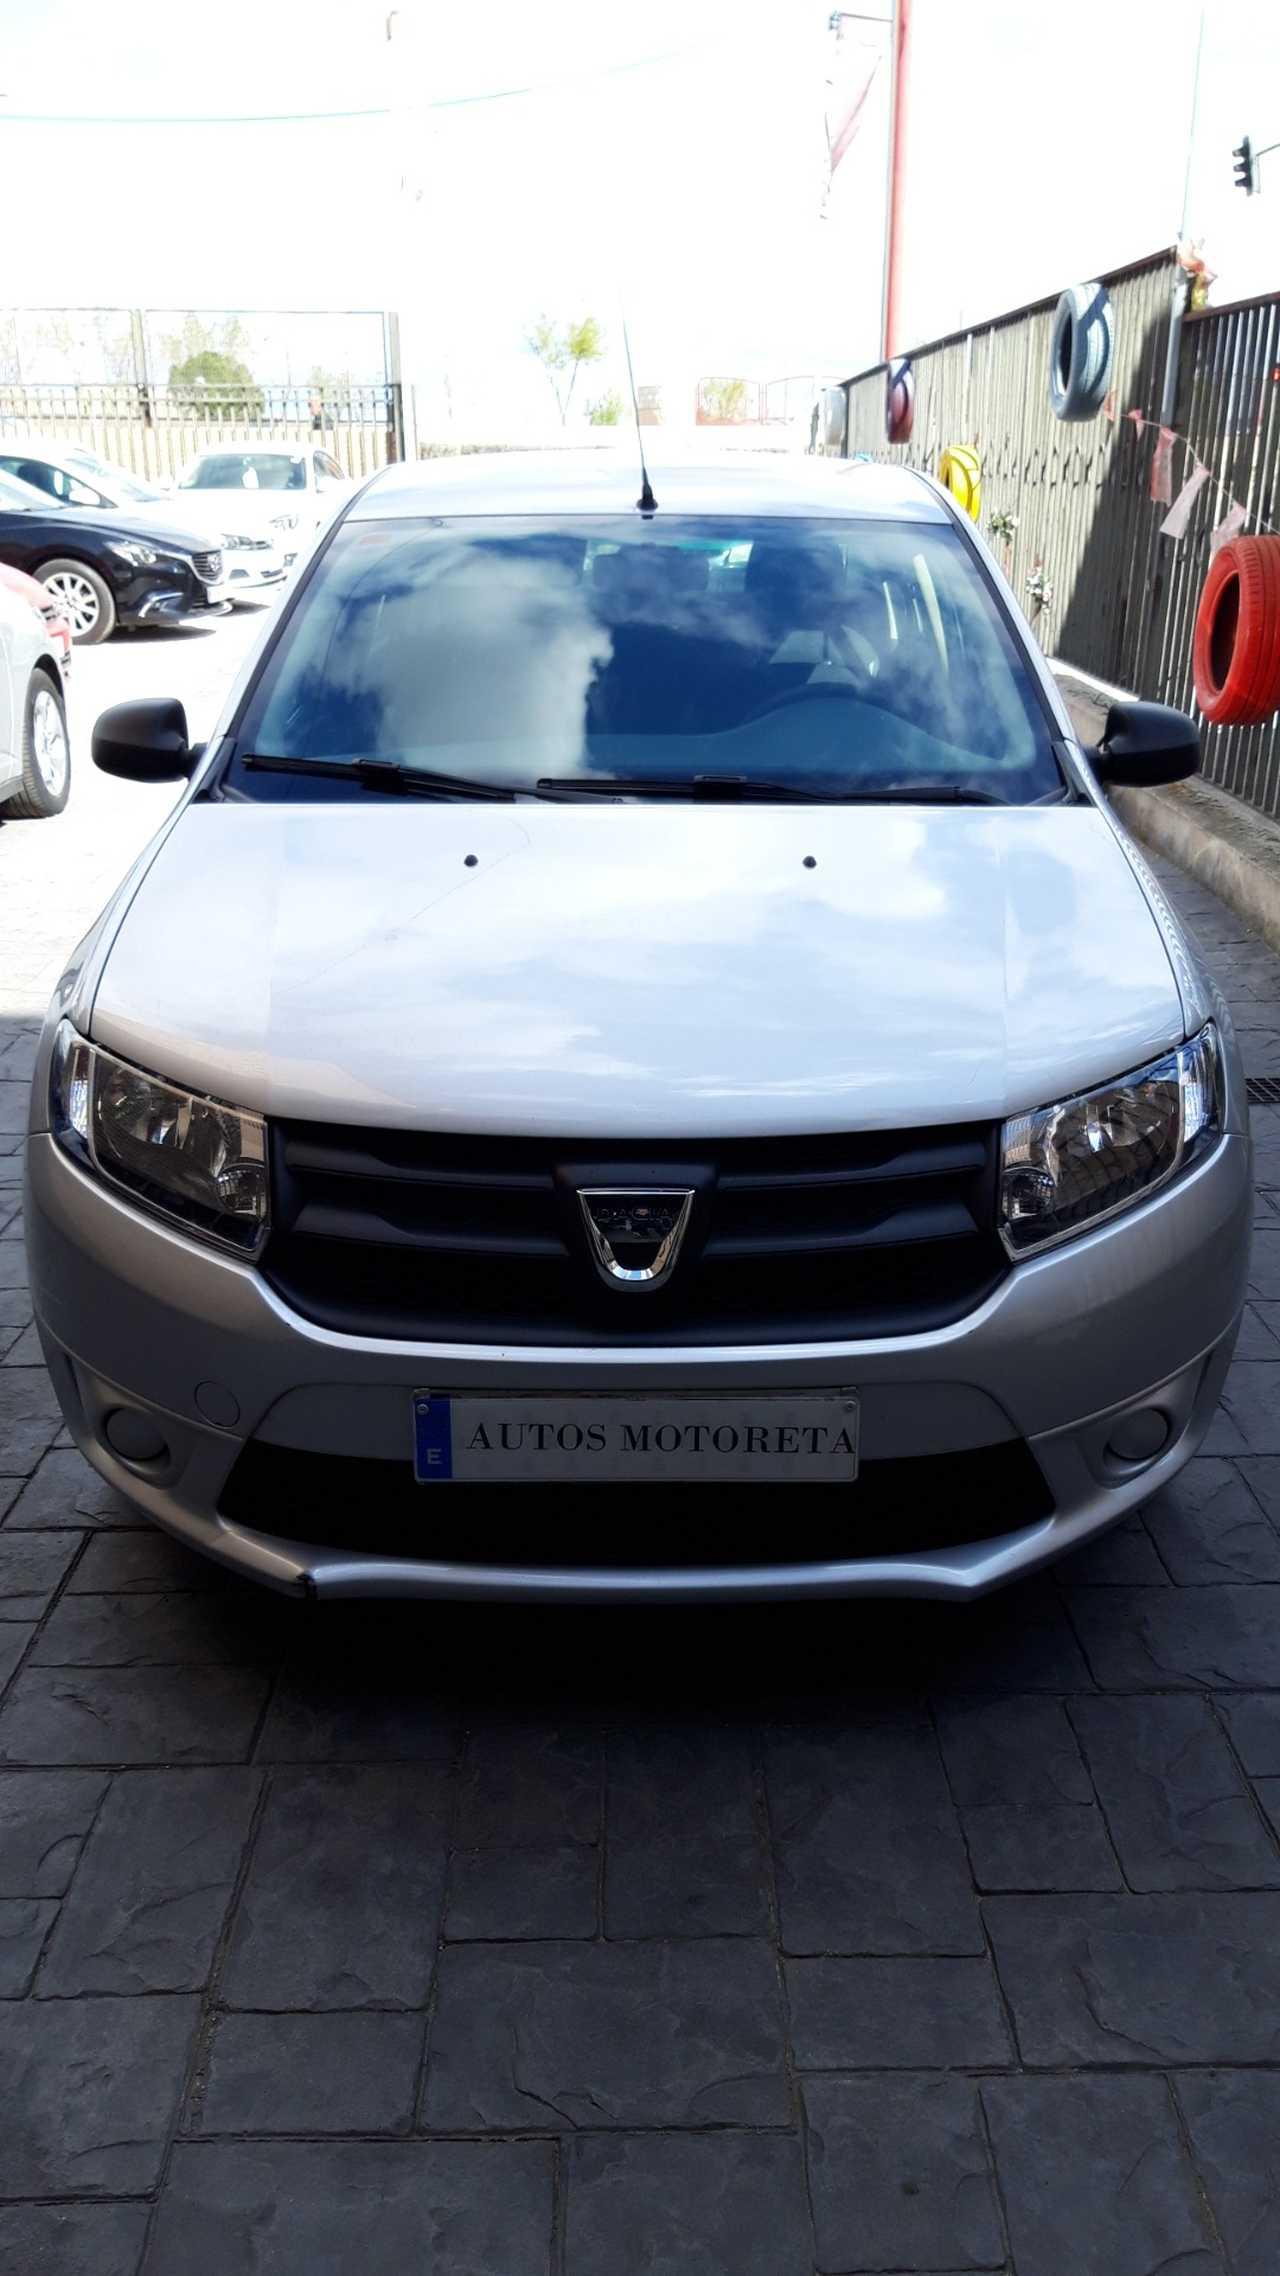 Dacia Logan 1.5 DCI   - Foto 1